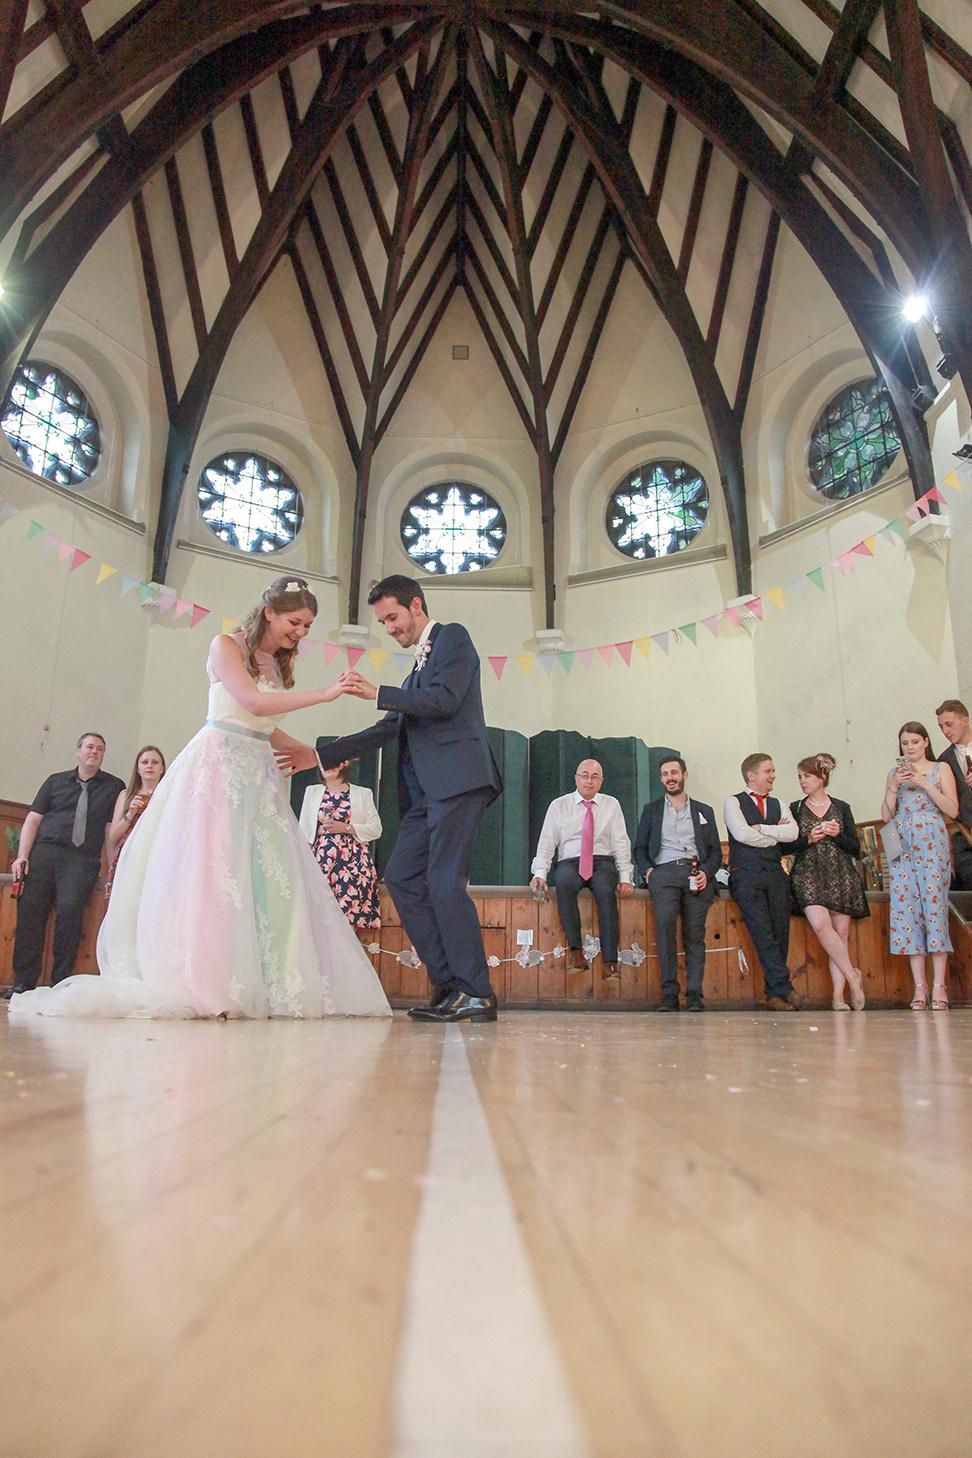 ian_wade_weddings 405_sm.jpg